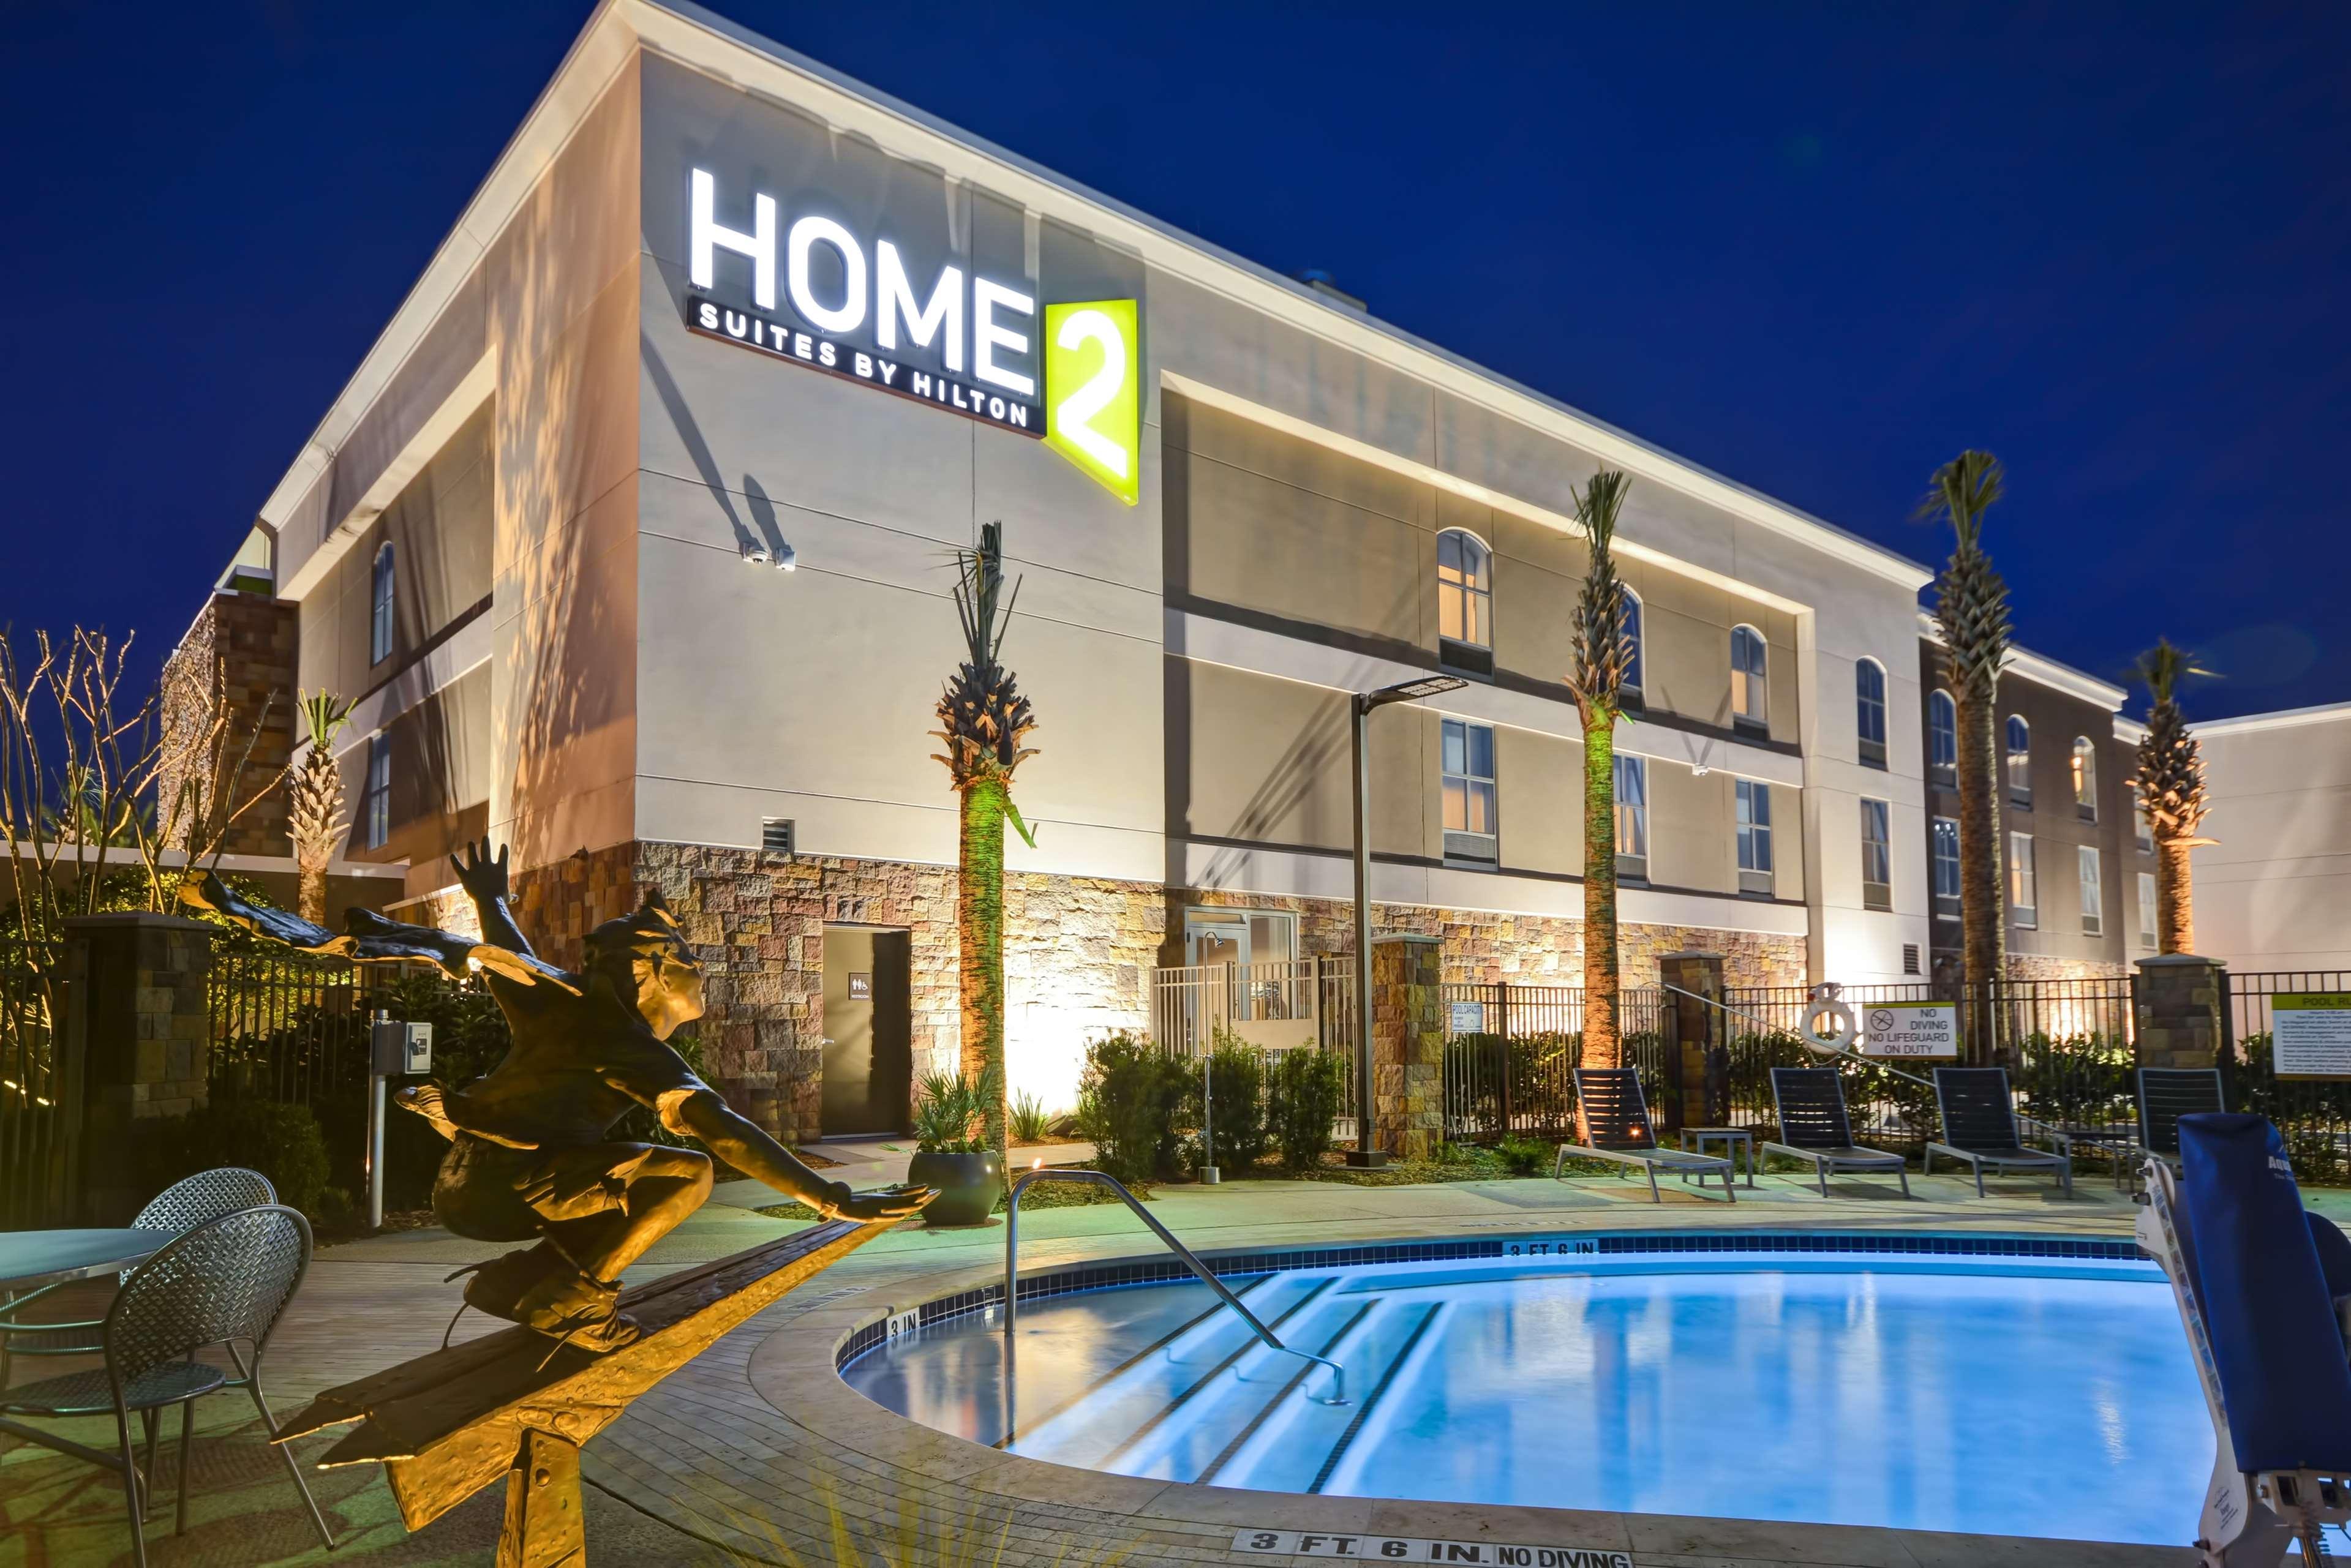 Home2 Suites by Hilton  St. Simons Island image 13